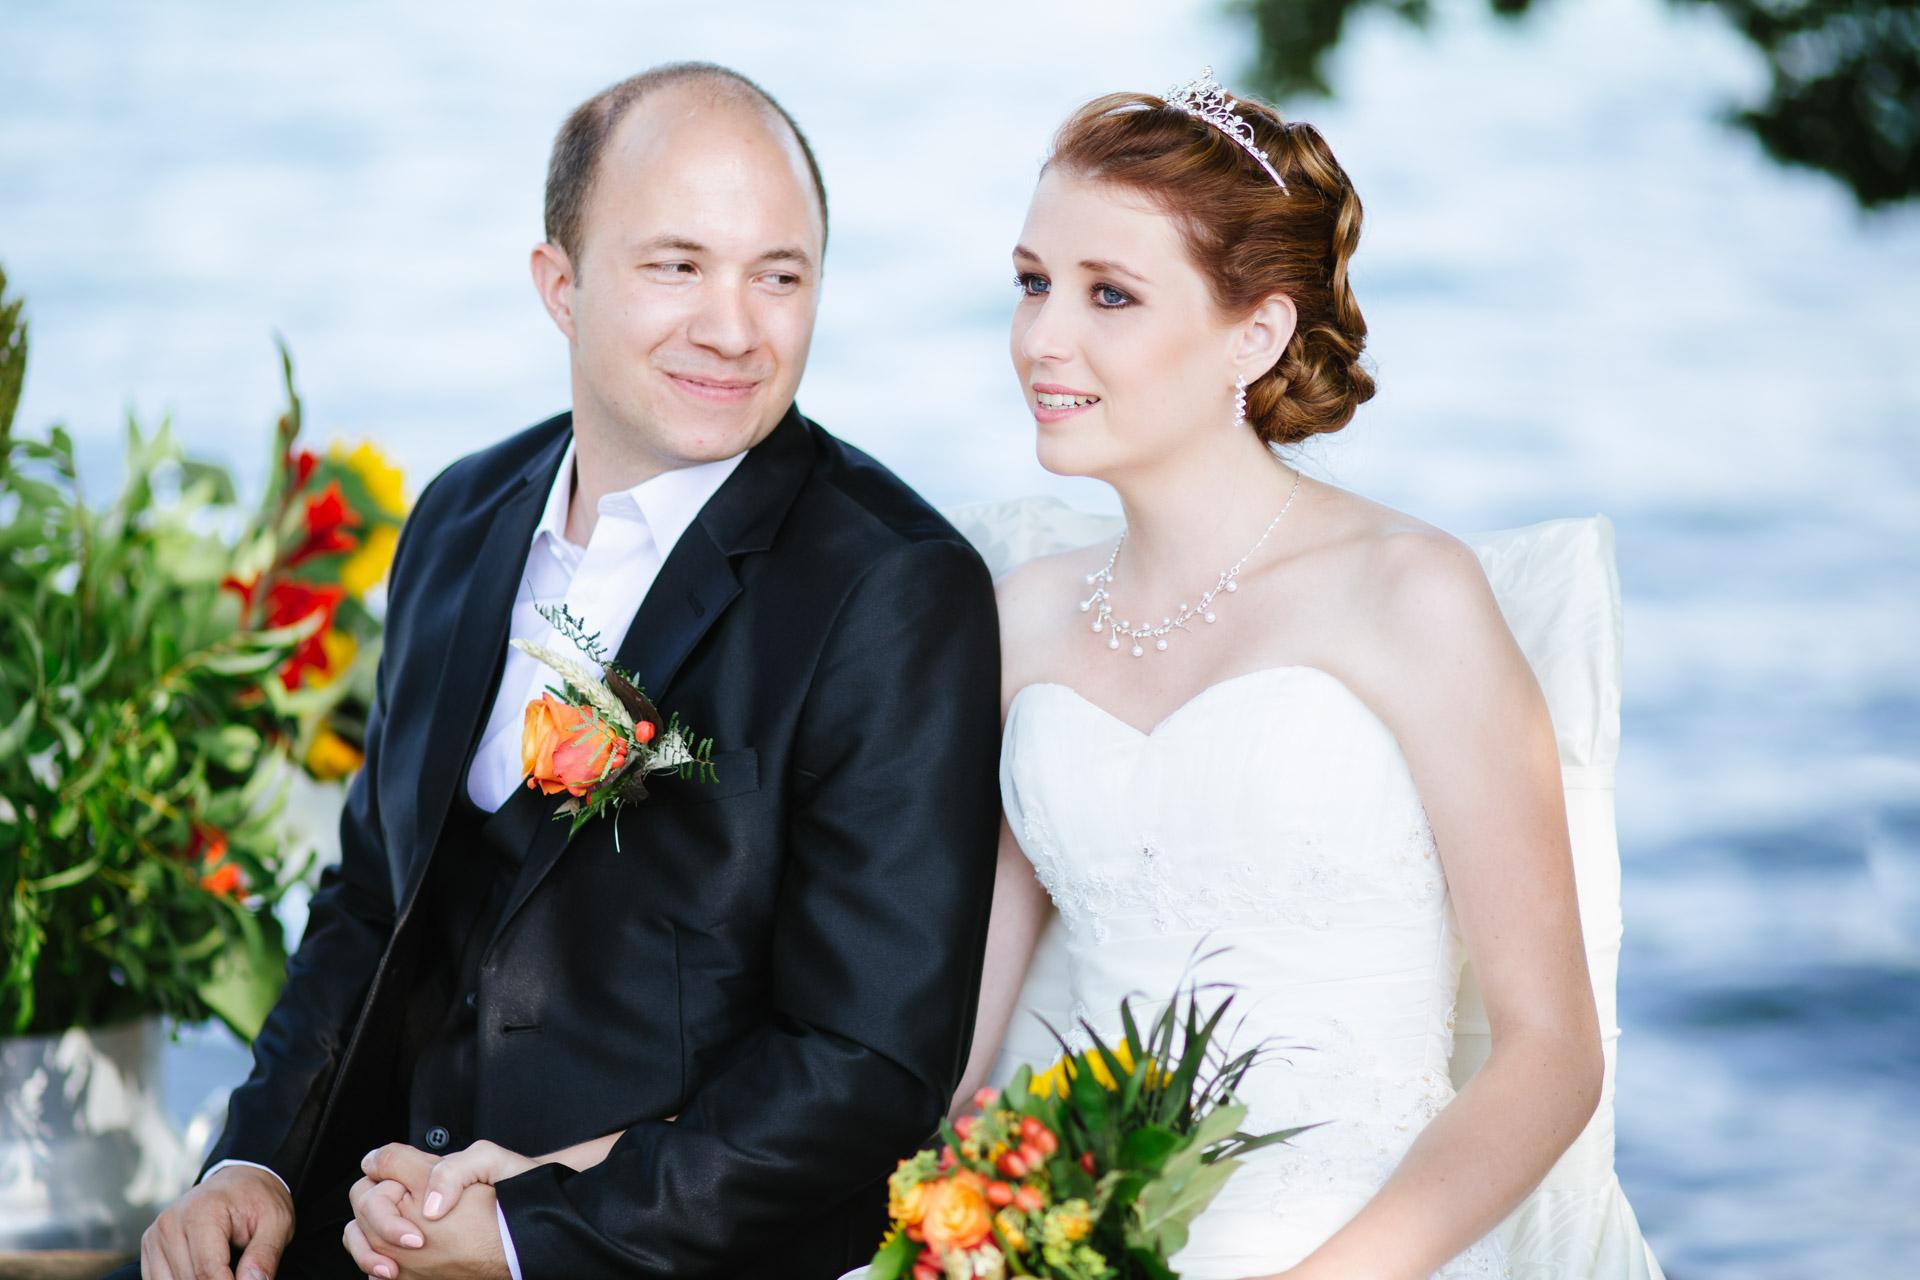 Pixelart_Hochzeitsfotografen_Loerrach_Rheinfelden_Hallwil_Schweiz_Linda-Ramon-1033